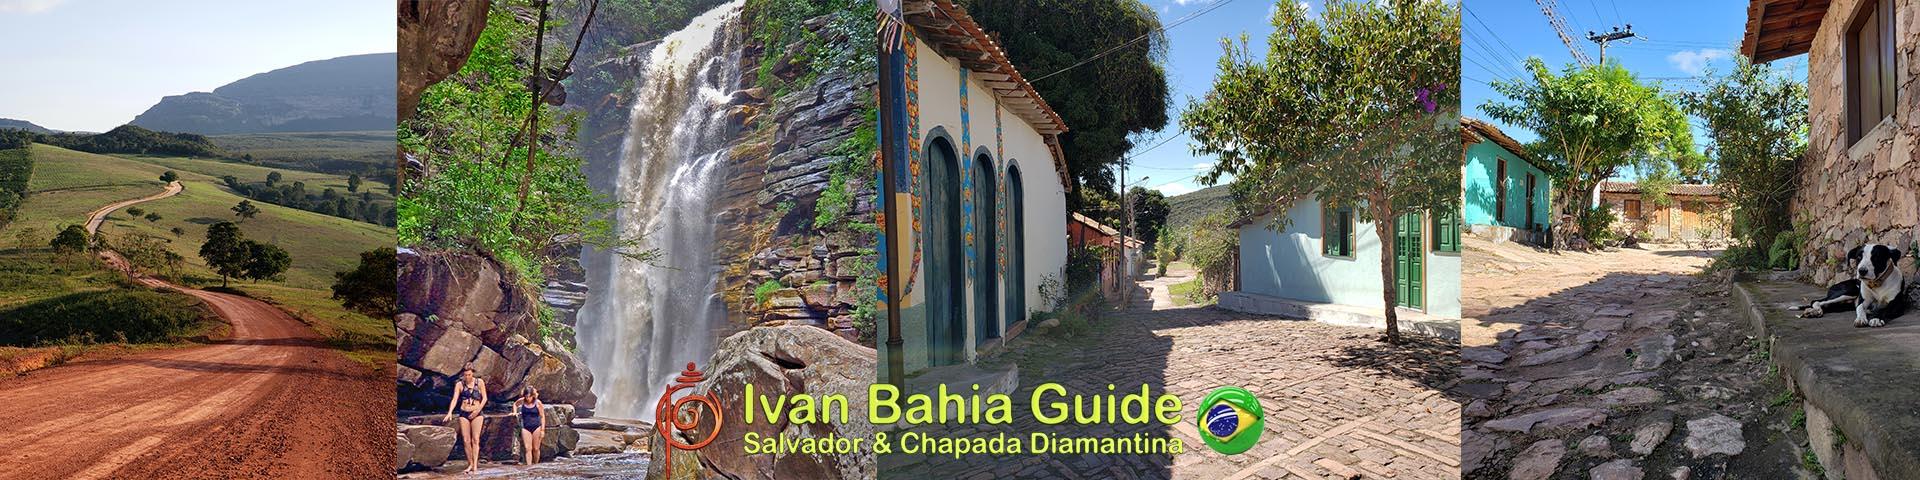 Ivan Bahia & Chapada Diamantina tour-guide / travel in Chapada Diamantina National Parc (known as the 'Brazilian Grand Canyon') / #ibtg #ibg #ivanbahiaguide #ivanbahiatravelguide #zenturturismo #ivanchapadadiamantinaguide #valedopati #patyvalley #pati #viapati #valecapao #ivanchapadaguide #chapadadiamantinatransfer #chapadatrekking #chapadaroots #chapadasoul #lencoisbahia #chapadadiamantinatrekking #ivanchapadadiamantinaguide  #chapadadiamantinaguide  #guidechapadadiamantina #lencois #lençois #chapadaadventuredaniel #diamondmountains #zentur # #guiachapadadiamantina #chapadaaventure #discoverchapada #chapadadiamond #chapadasoul #diamantinatrip  #tripadvisor #bahiametisse, #fernandobingre, #ivansalvadorbahia #salvadorbahiaTravel #toursbylocals #fotosbahia #bahiafotos #chapadadiamantinanationalpark #yourtoursbrazil #maurotours #bahiatopturismo #bahiapremium #maisbahiaturismo #fernandobingretourguide #cassiturismo